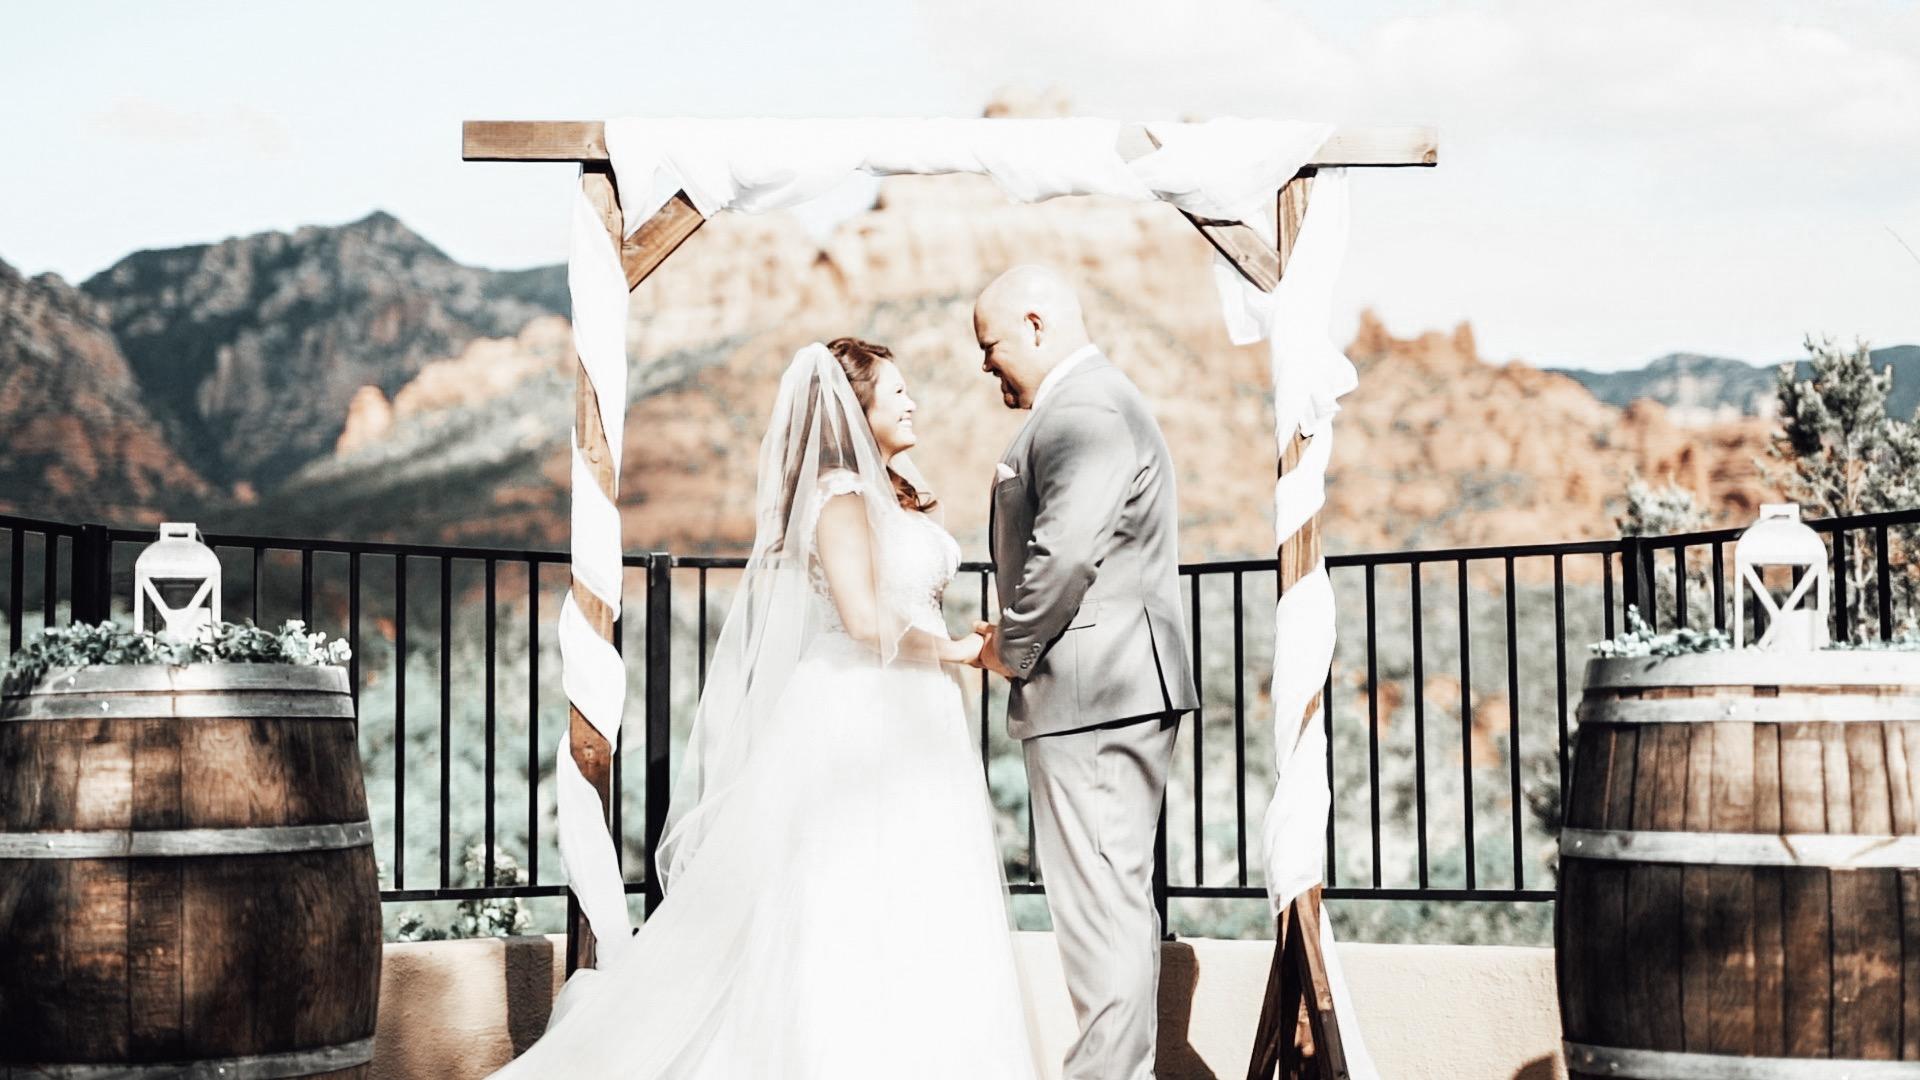 J.P. + JoAnna | Sedona, Arizona | Sedona Cedars Resort